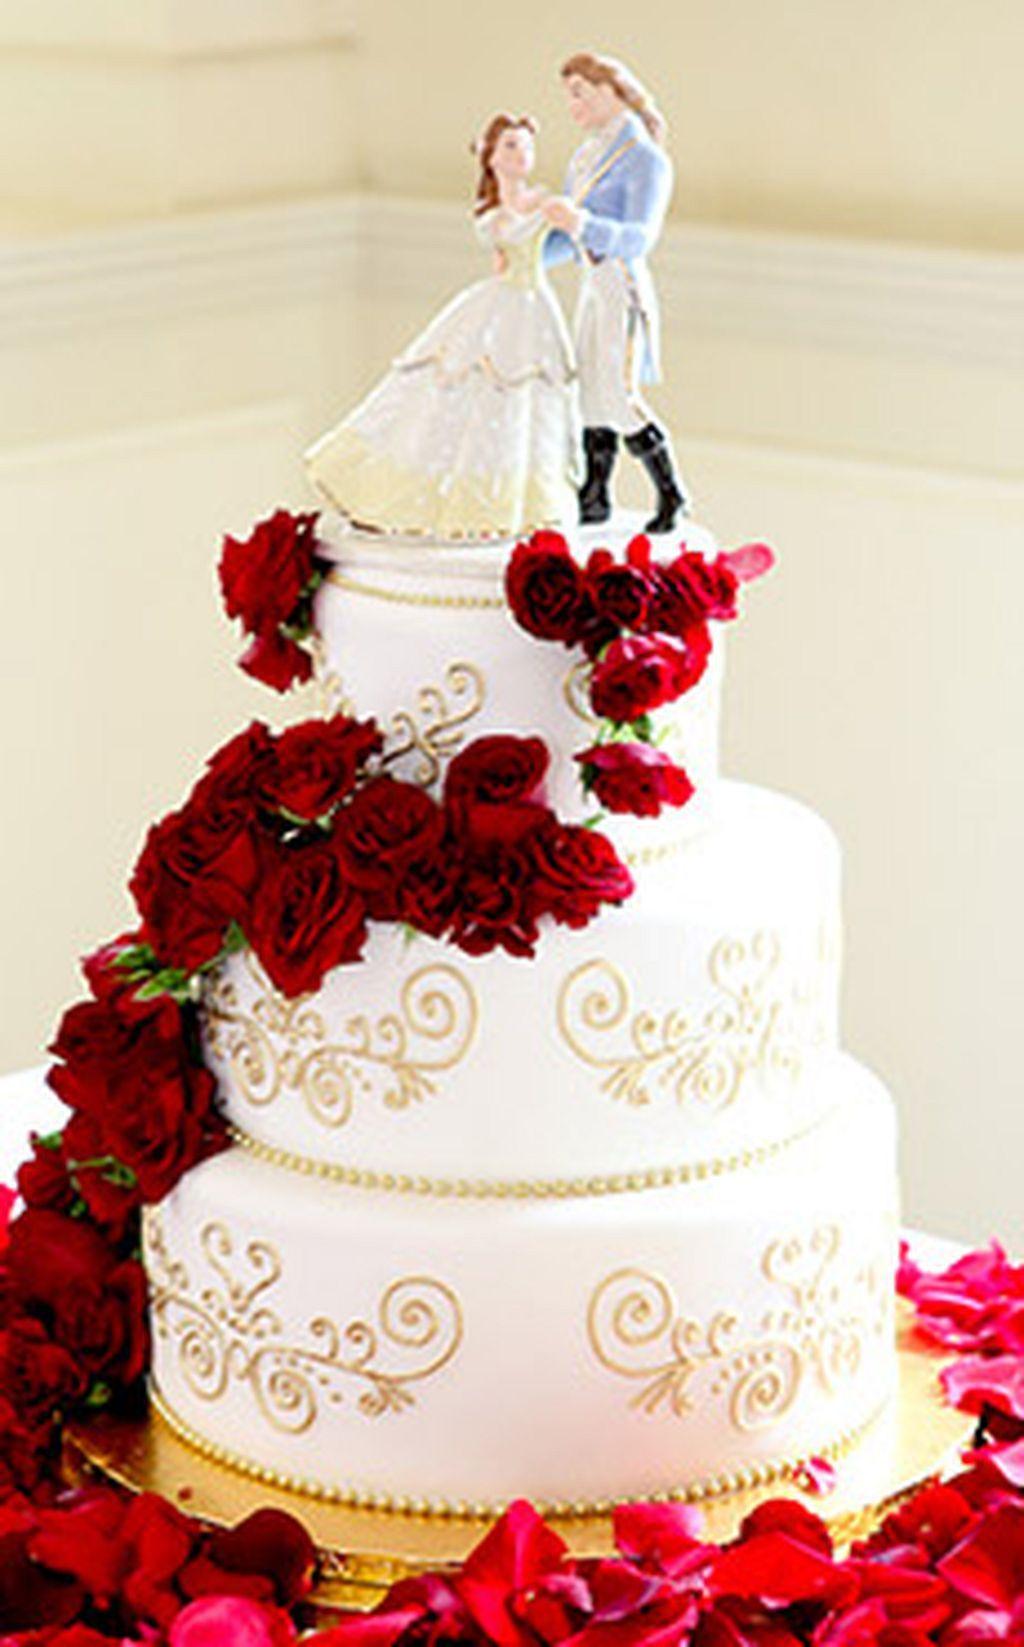 80 beauty and the beast wedding ideas 52 | Beast, Weddings and Cake